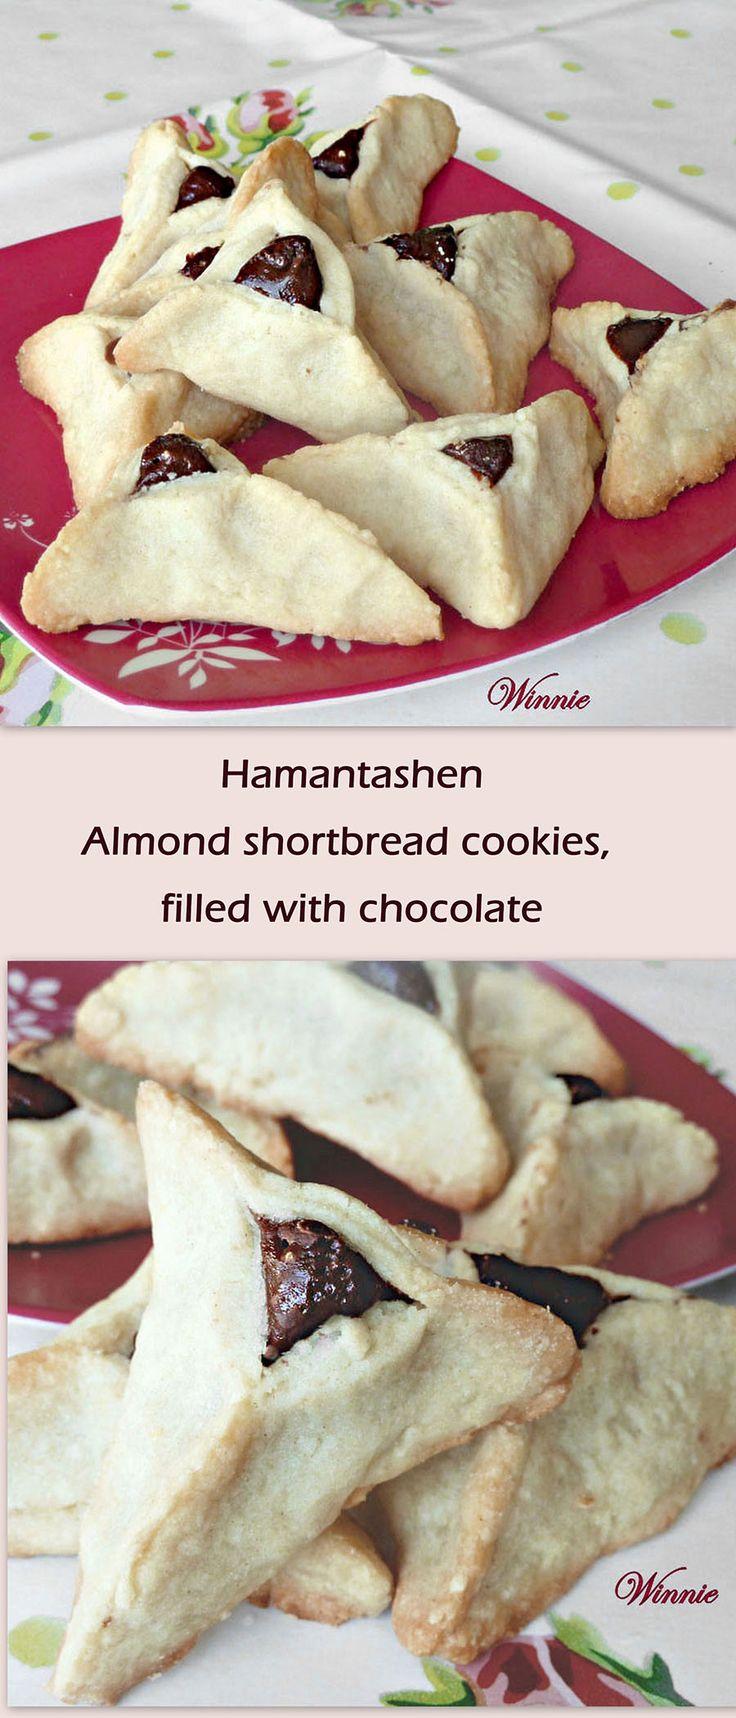 Good food recipes » Chocolate almond shortbread cookie recipe